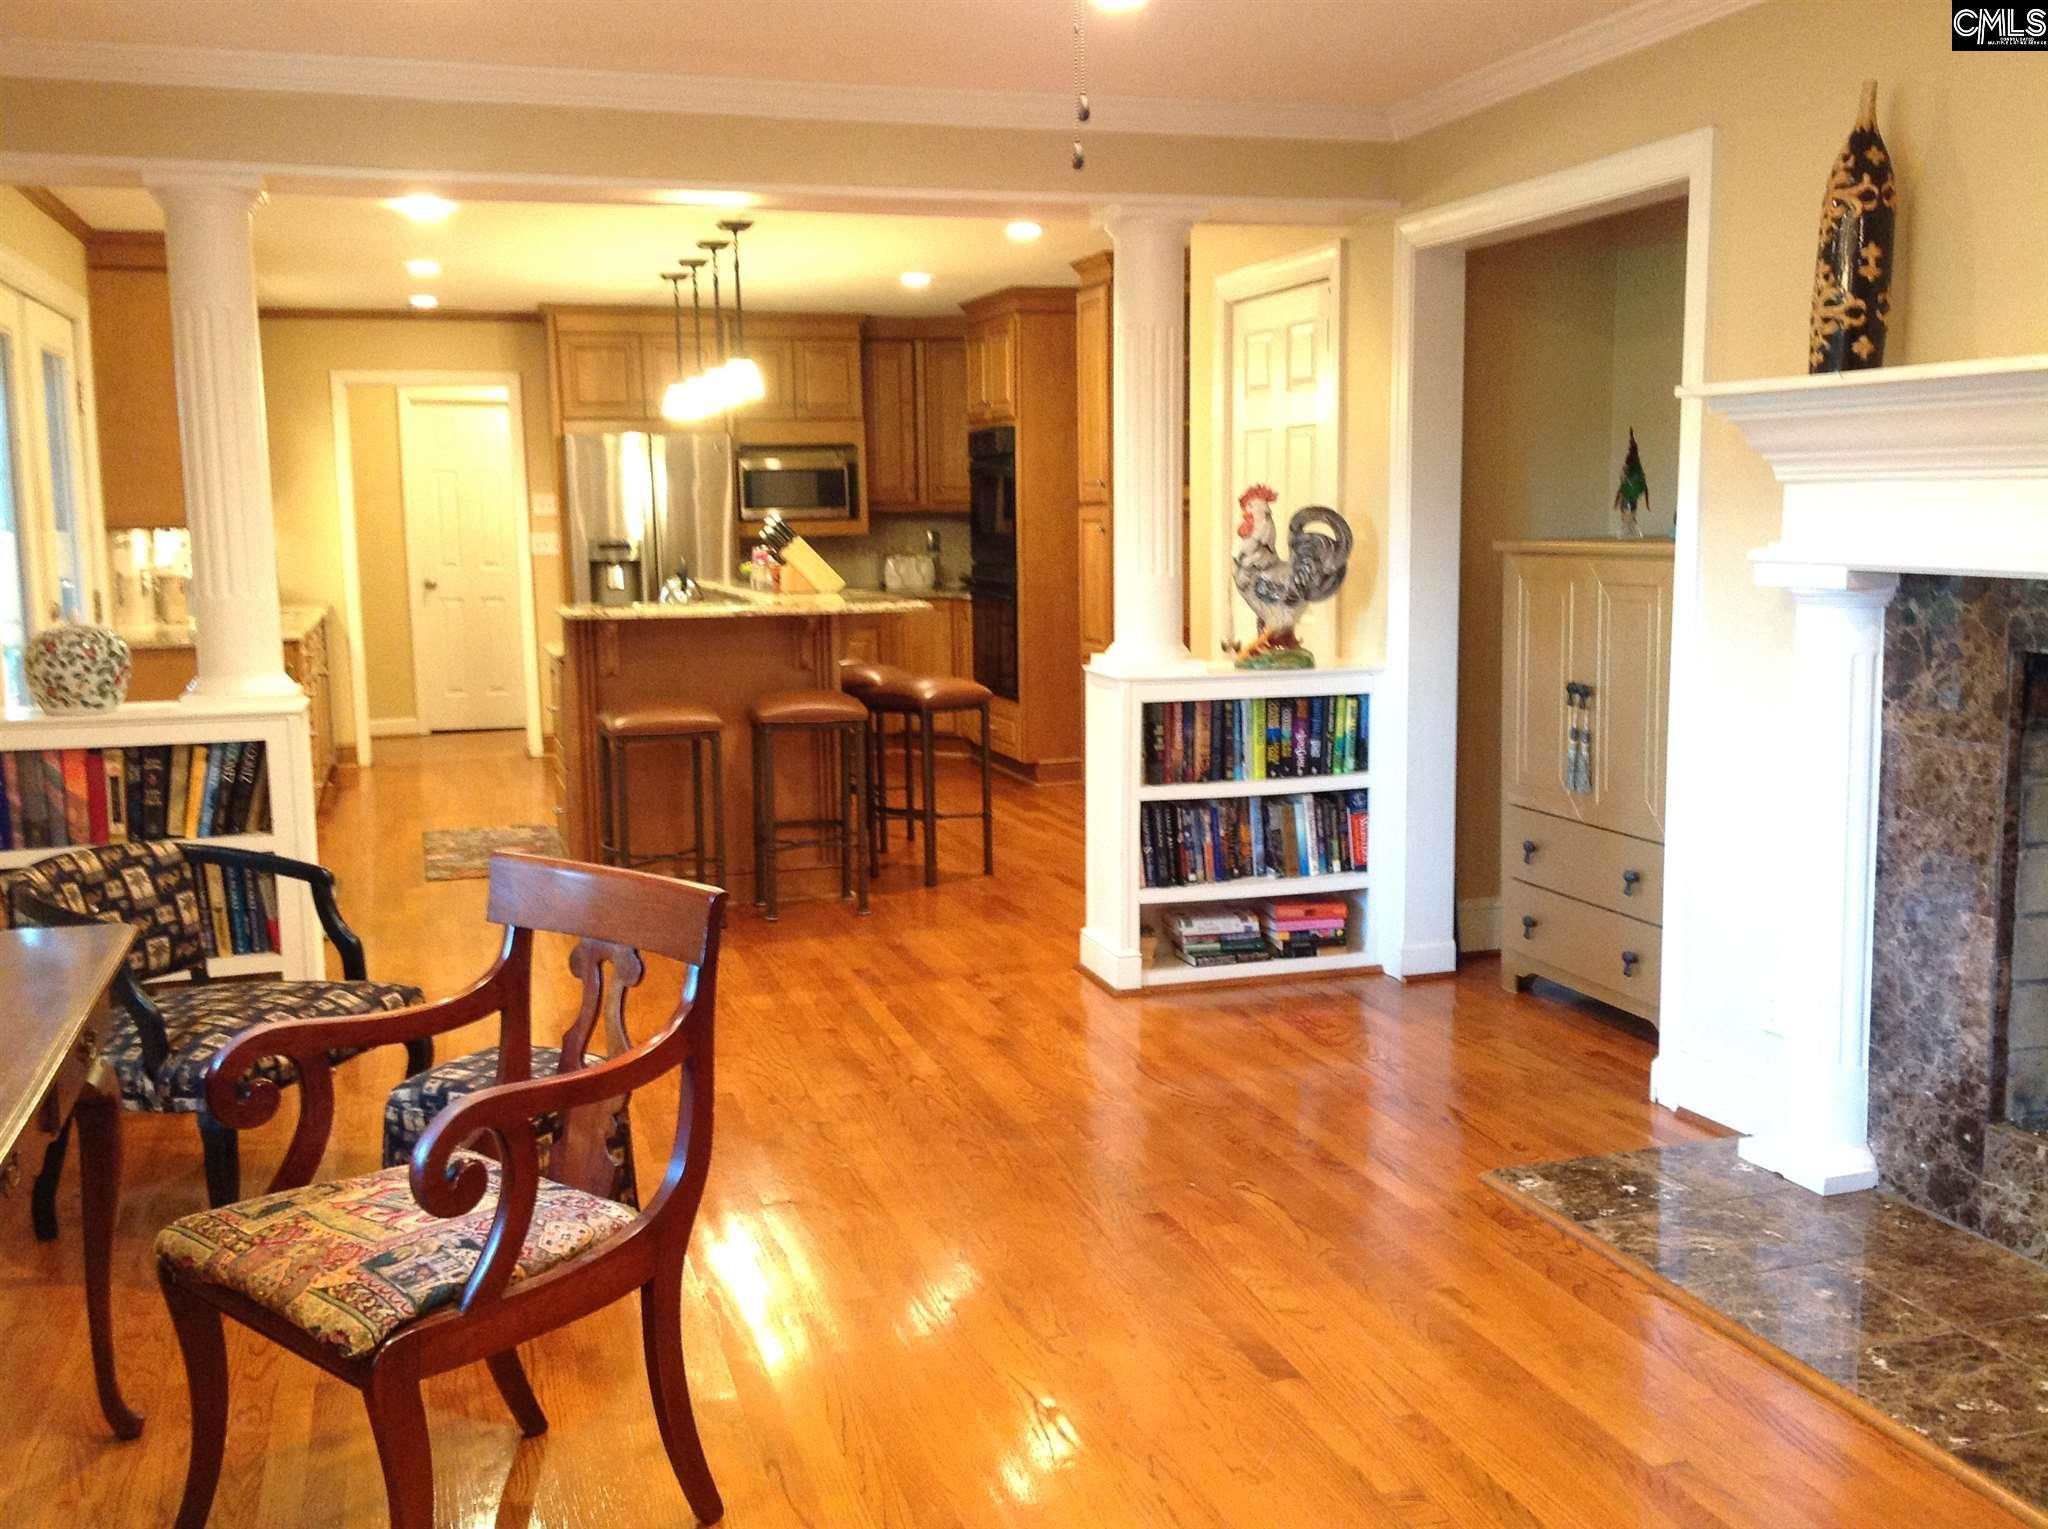 Hardwood Flooring Columbia Sc Of 160 Castle Columbia Sc Mls 457454 Camelia Ware 803 552 5160 Inside Property Photo